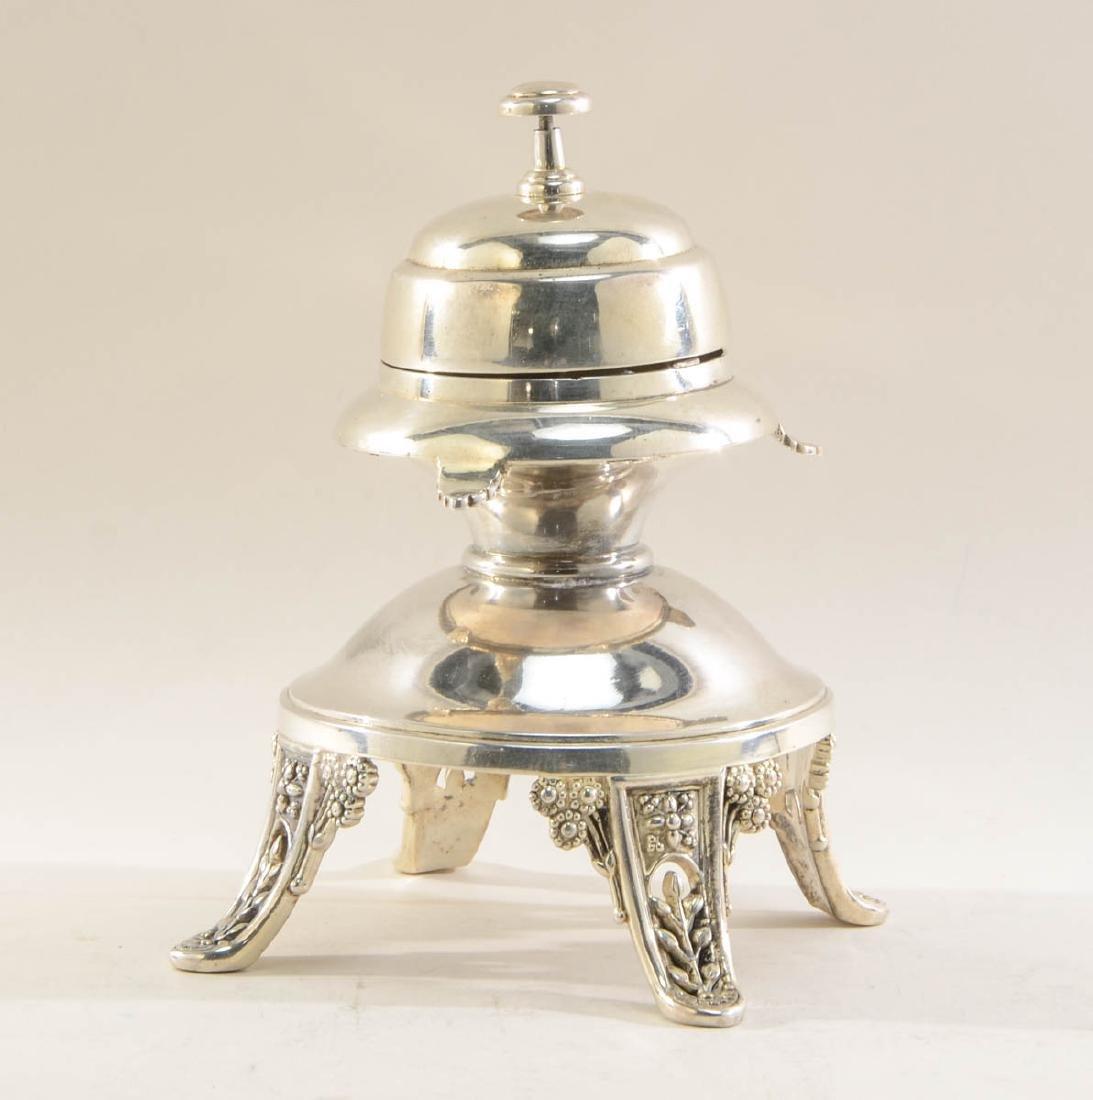 Meriden Britannia Silverplate Service Bell